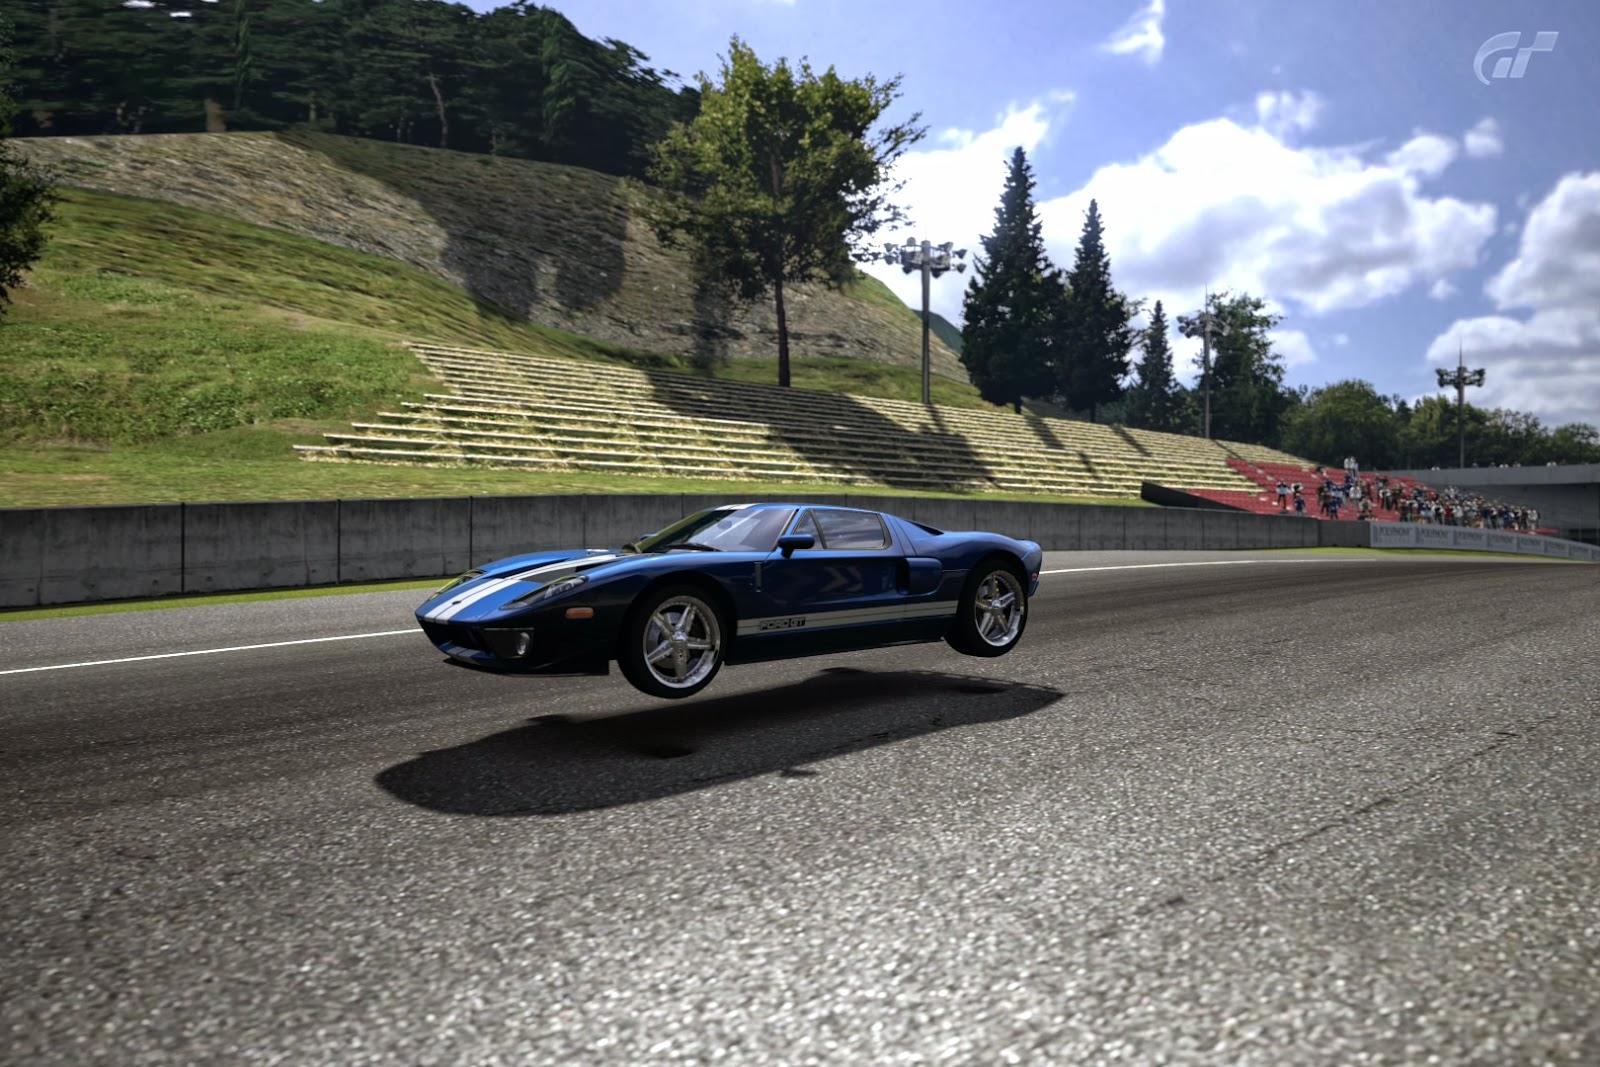 Gt5 fun 2 drift chevrolet camaro iroc z concept 39 88 for Interior 88 camaro